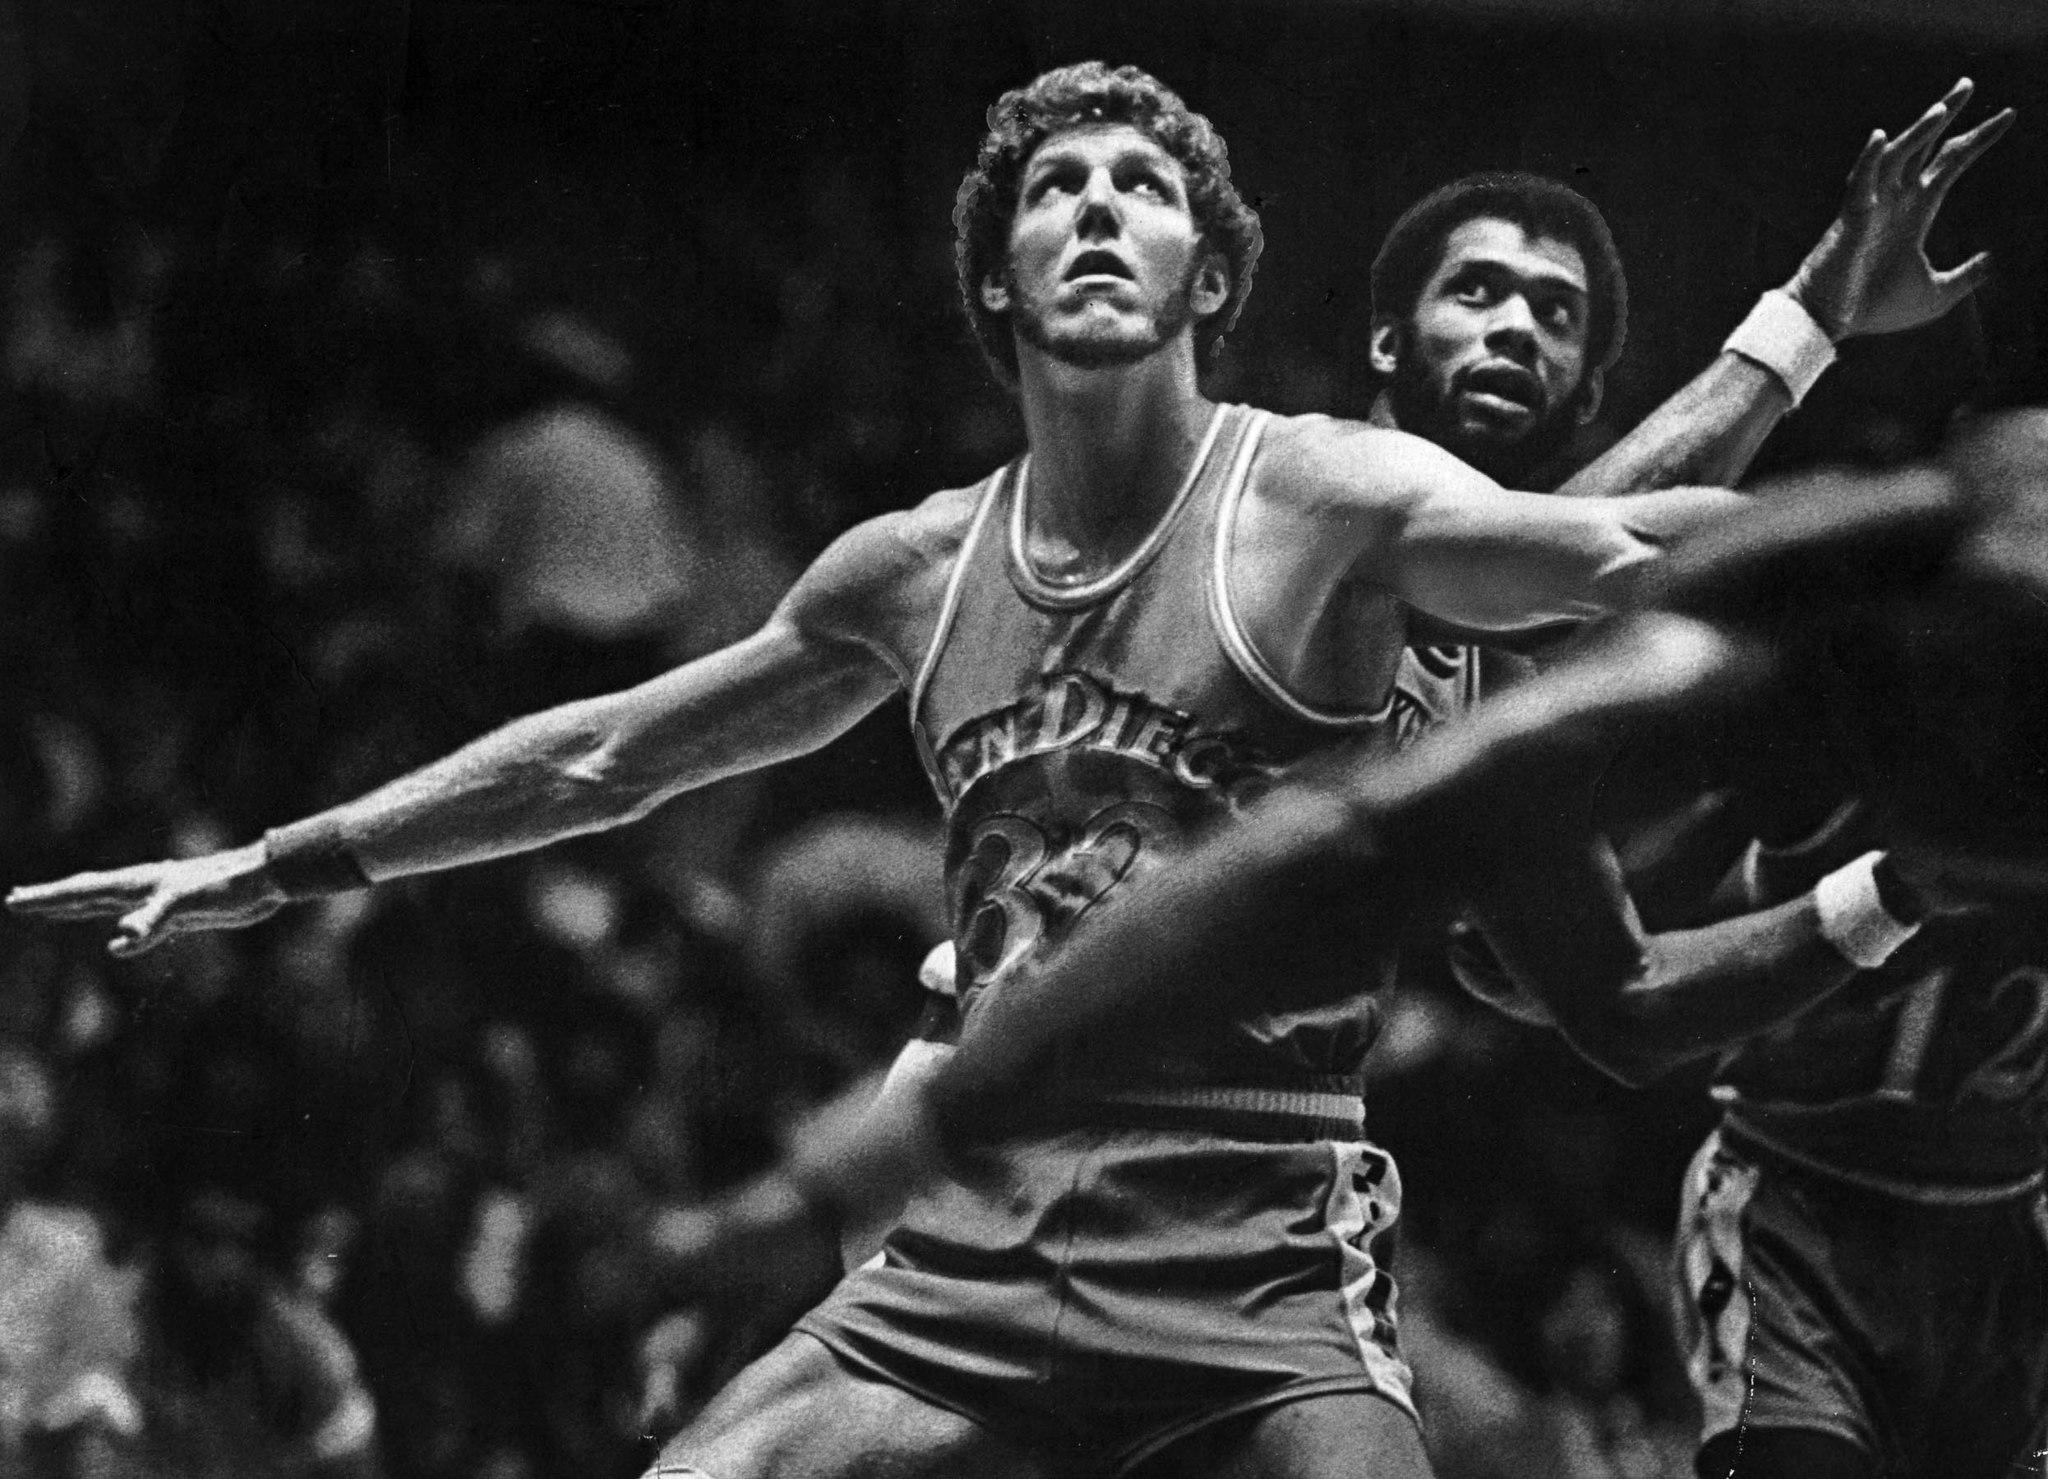 Bill Walton and Kareem Abdul-Jabbar